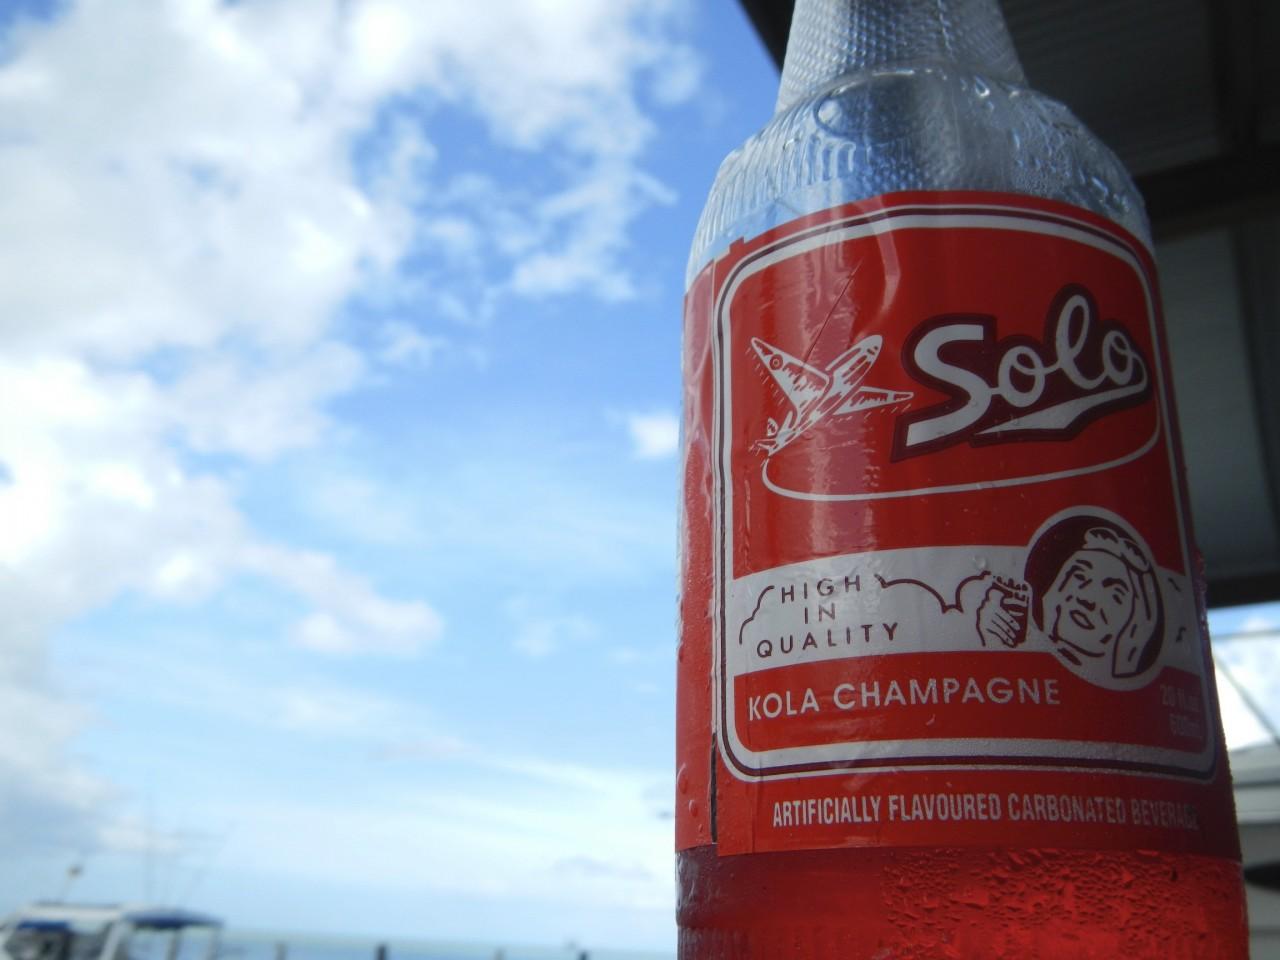 Solo Kola Champagne